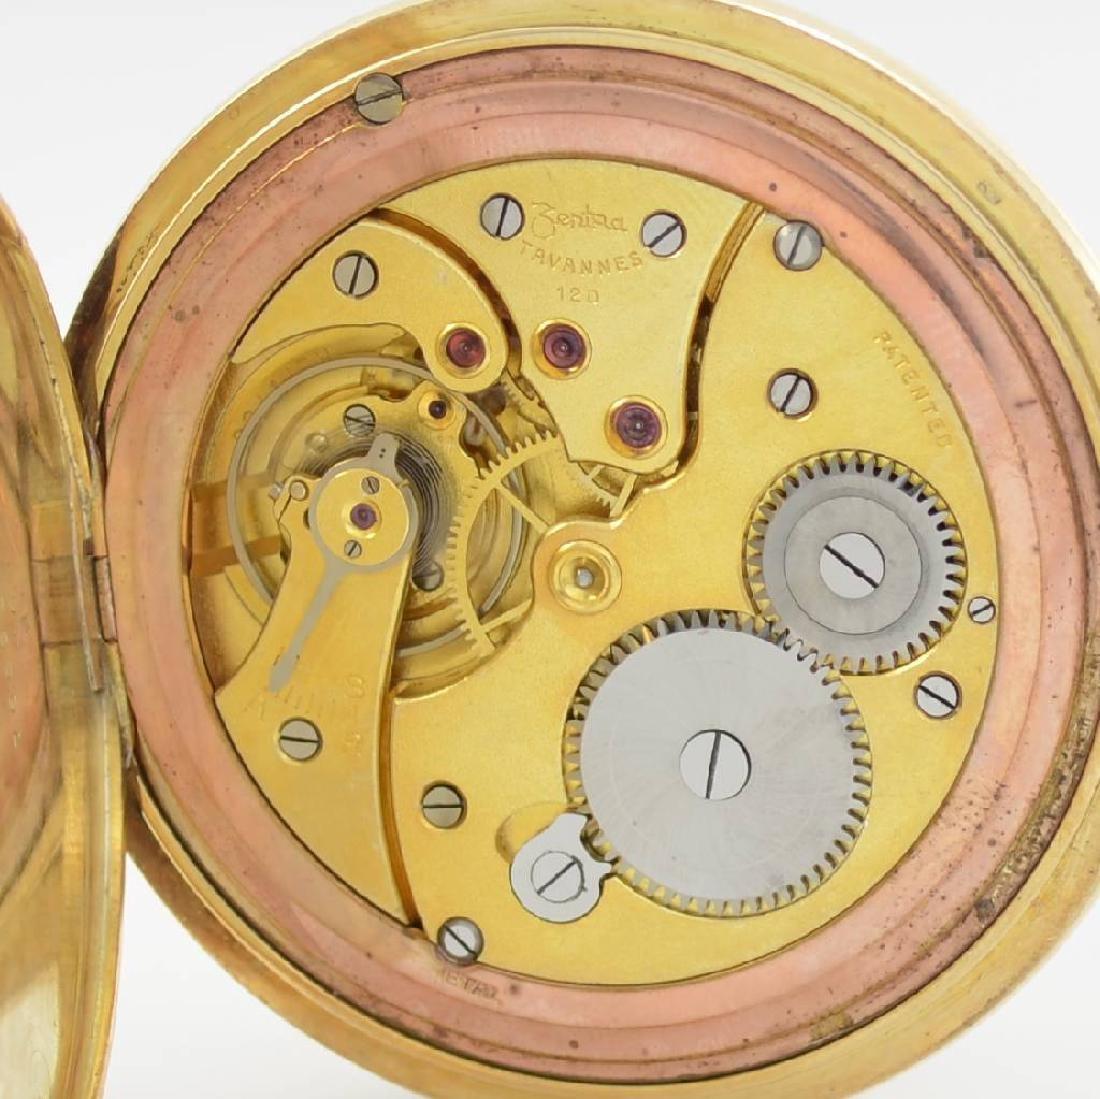 ZENTRA/TAVANNES 14k yellow gold hunting cased pocket - 8